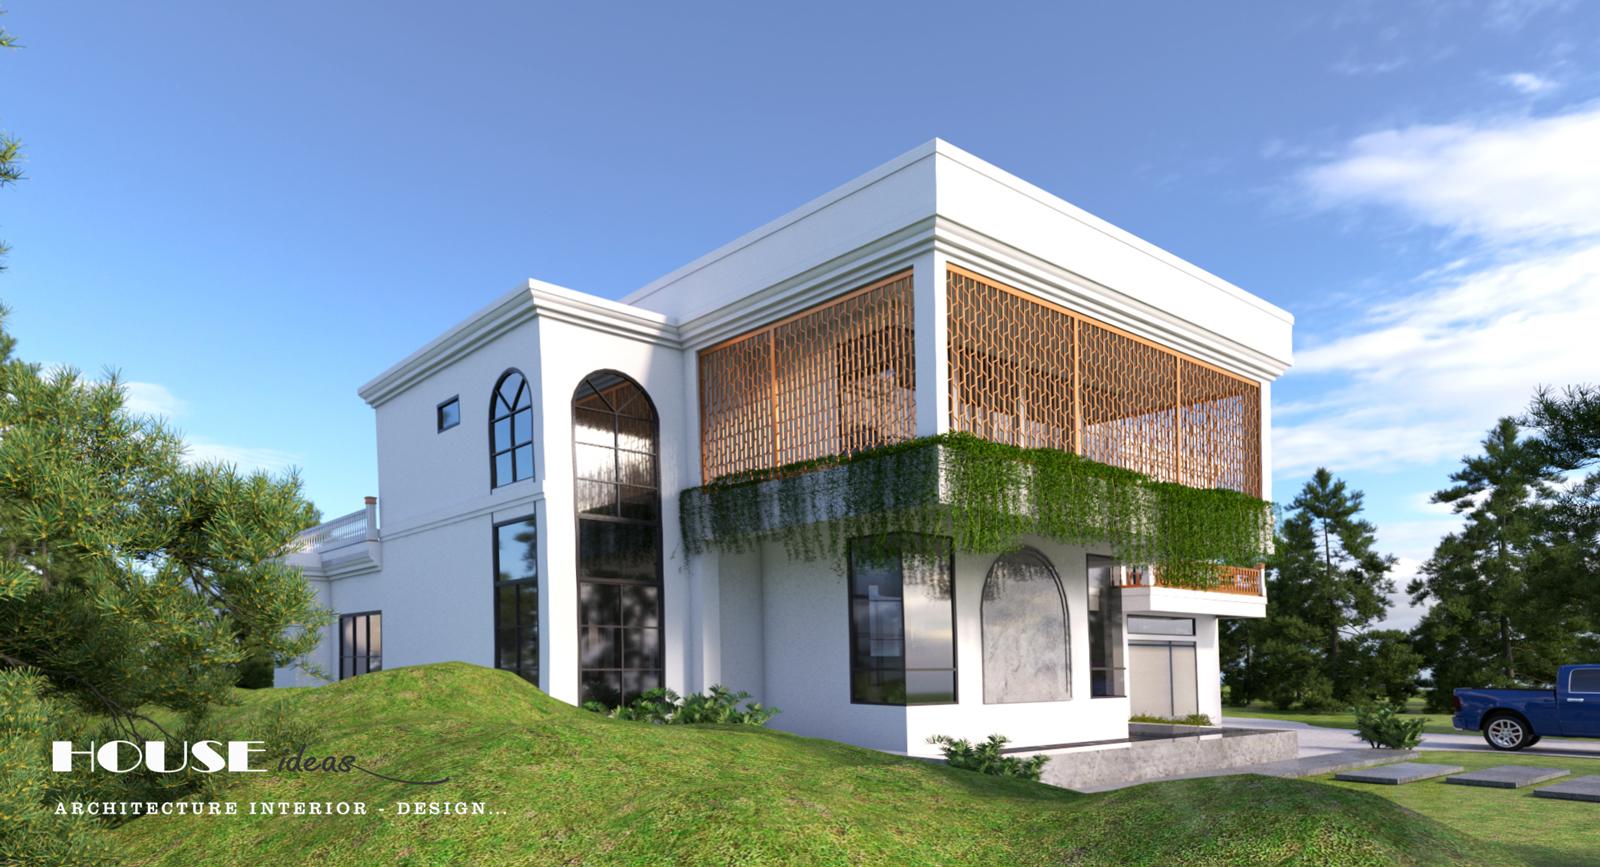 thiết kế kiên trúc